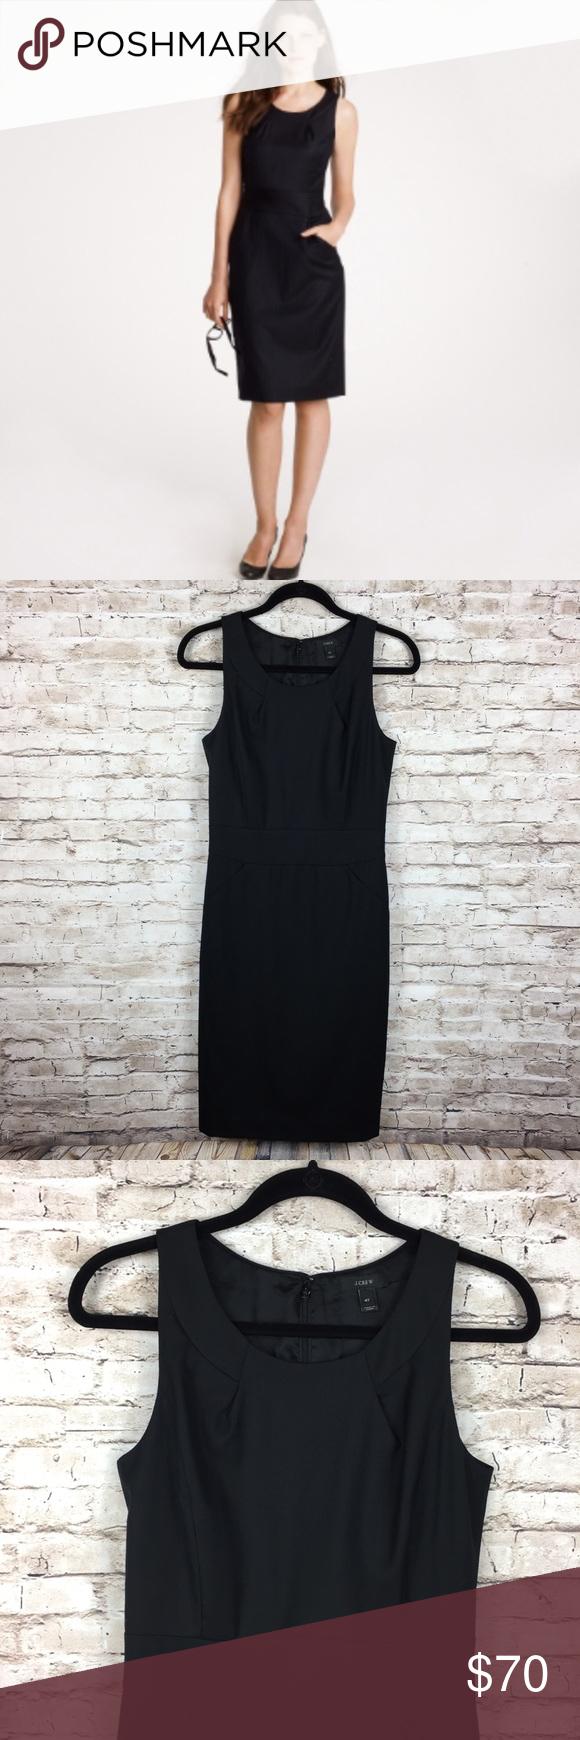 J Crew Emmaleigh Black Sleeveless Wool Dress 4t Wool Dress Clothes Design Dresses [ 1740 x 580 Pixel ]